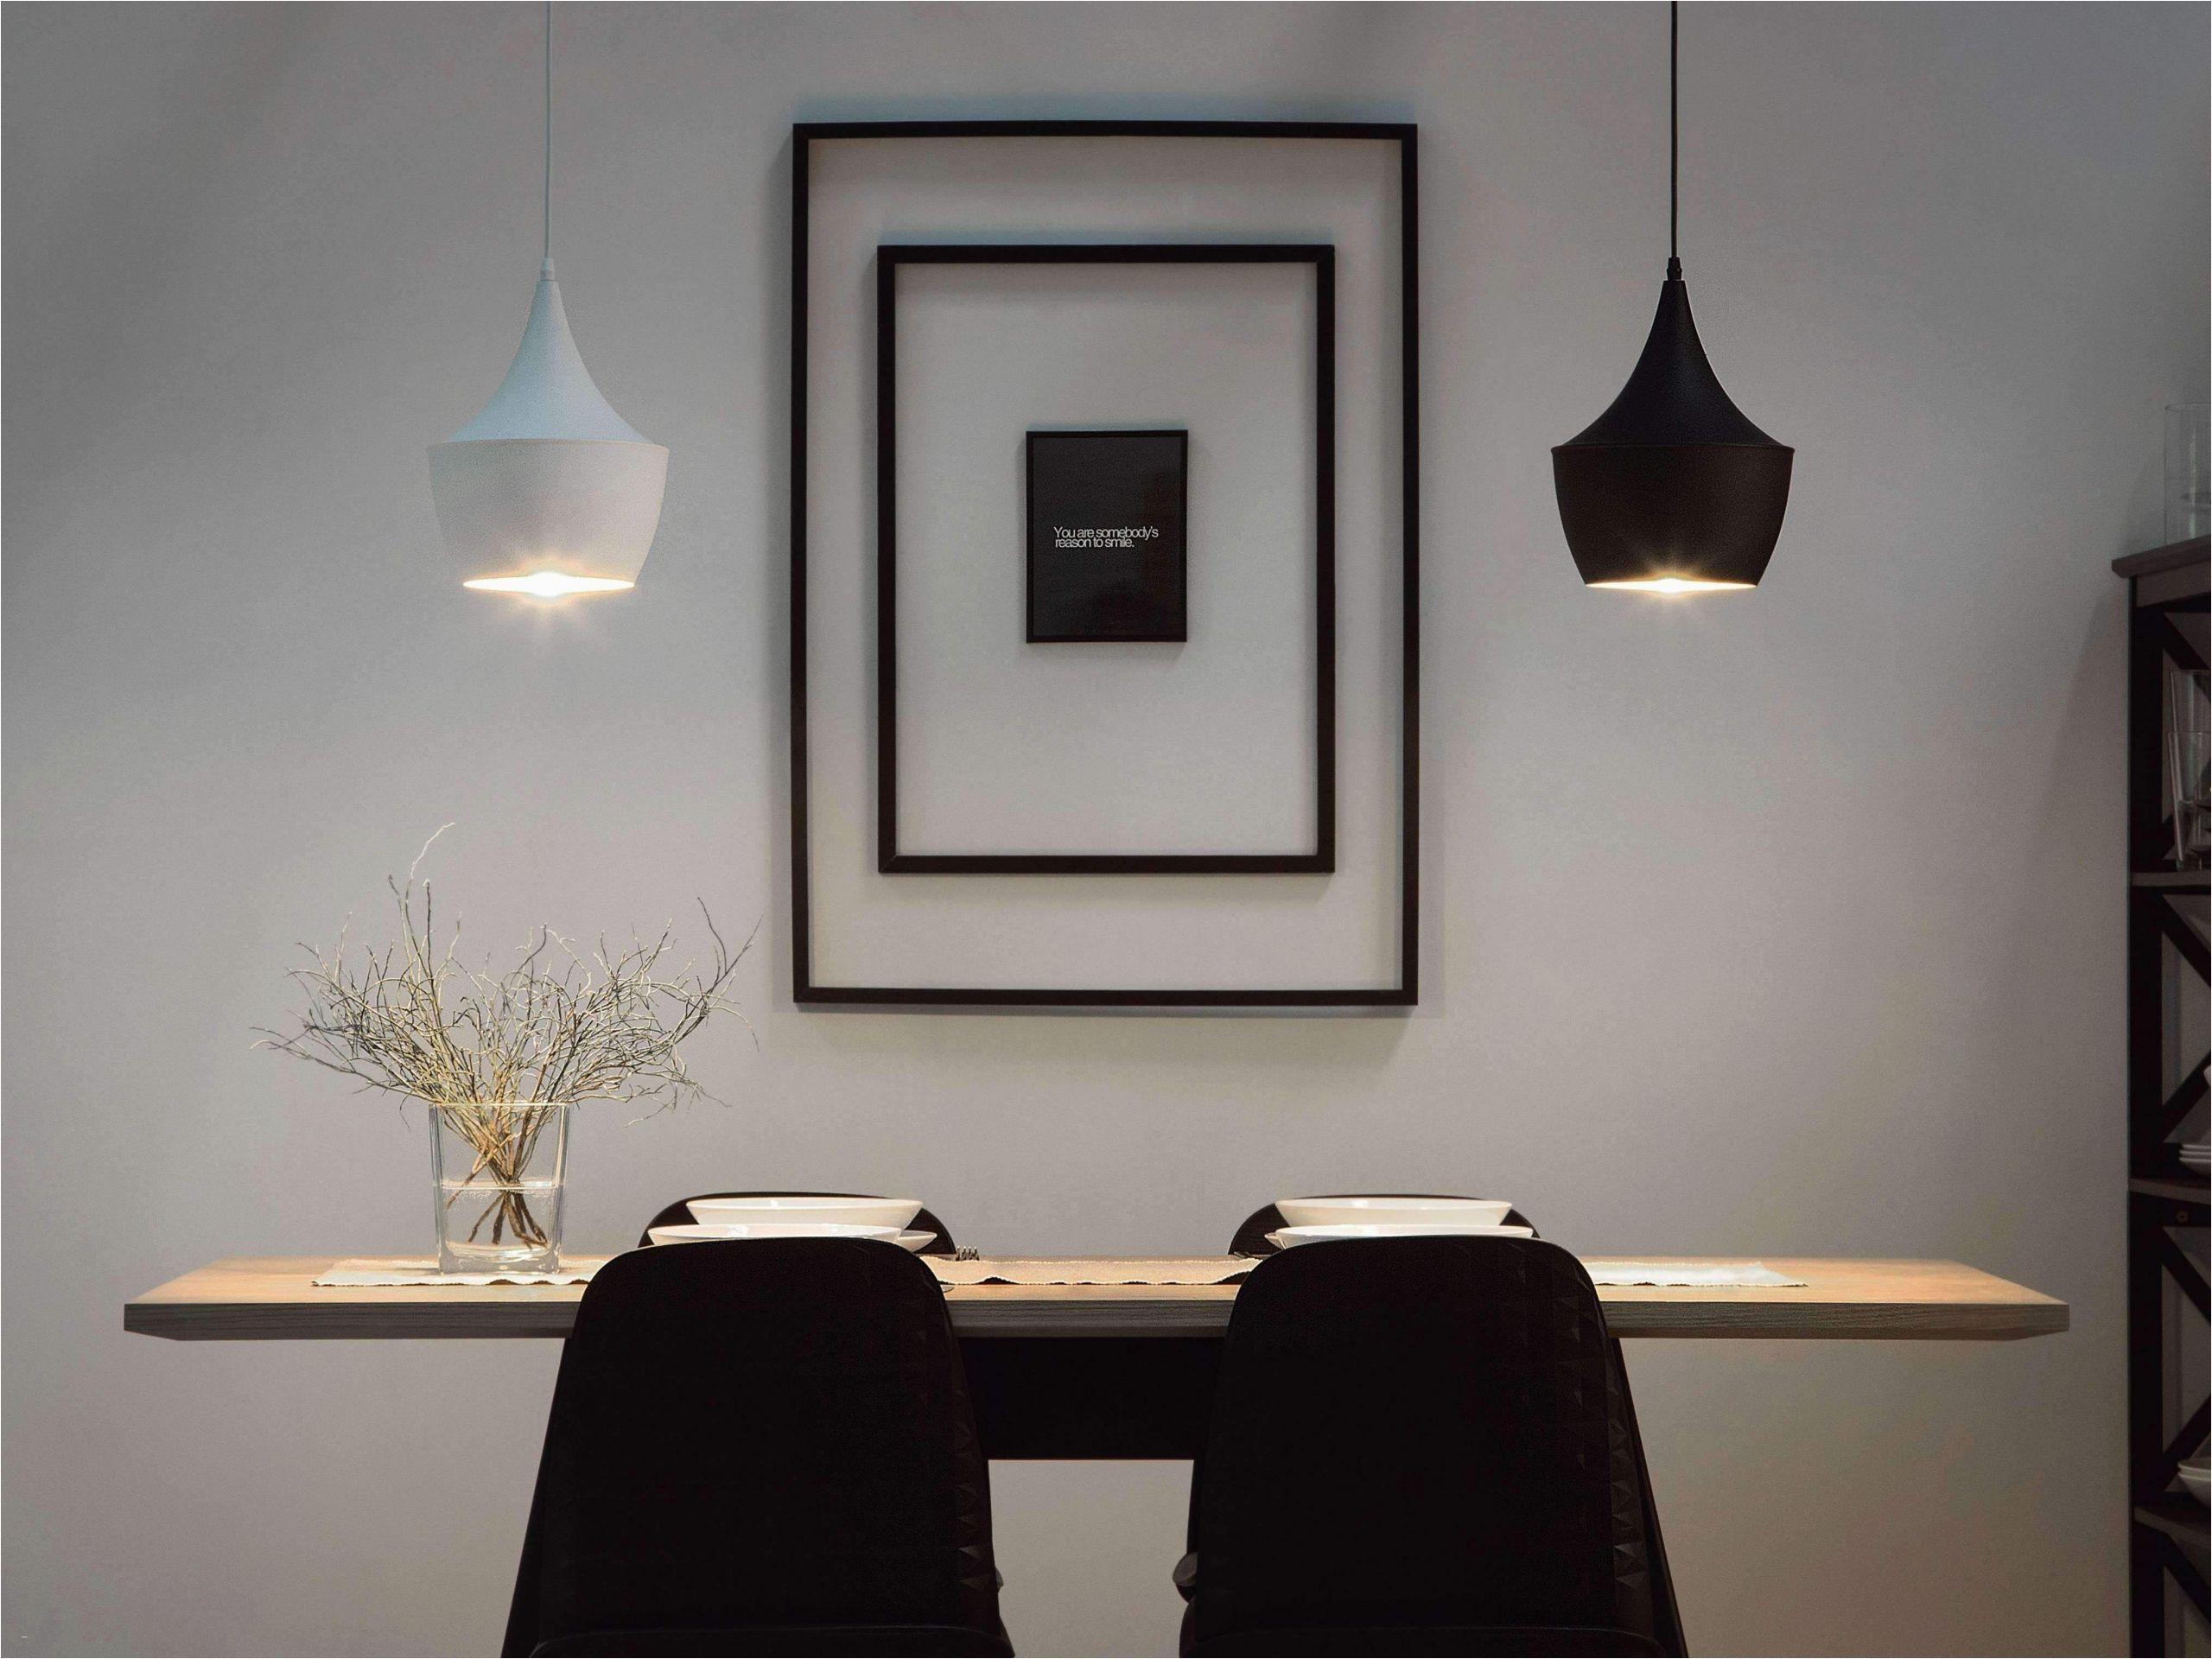 wohnzimmer lampe led inspirierend badezimmer lampen luxus badezimmer lampe of wohnzimmer lampe led scaled